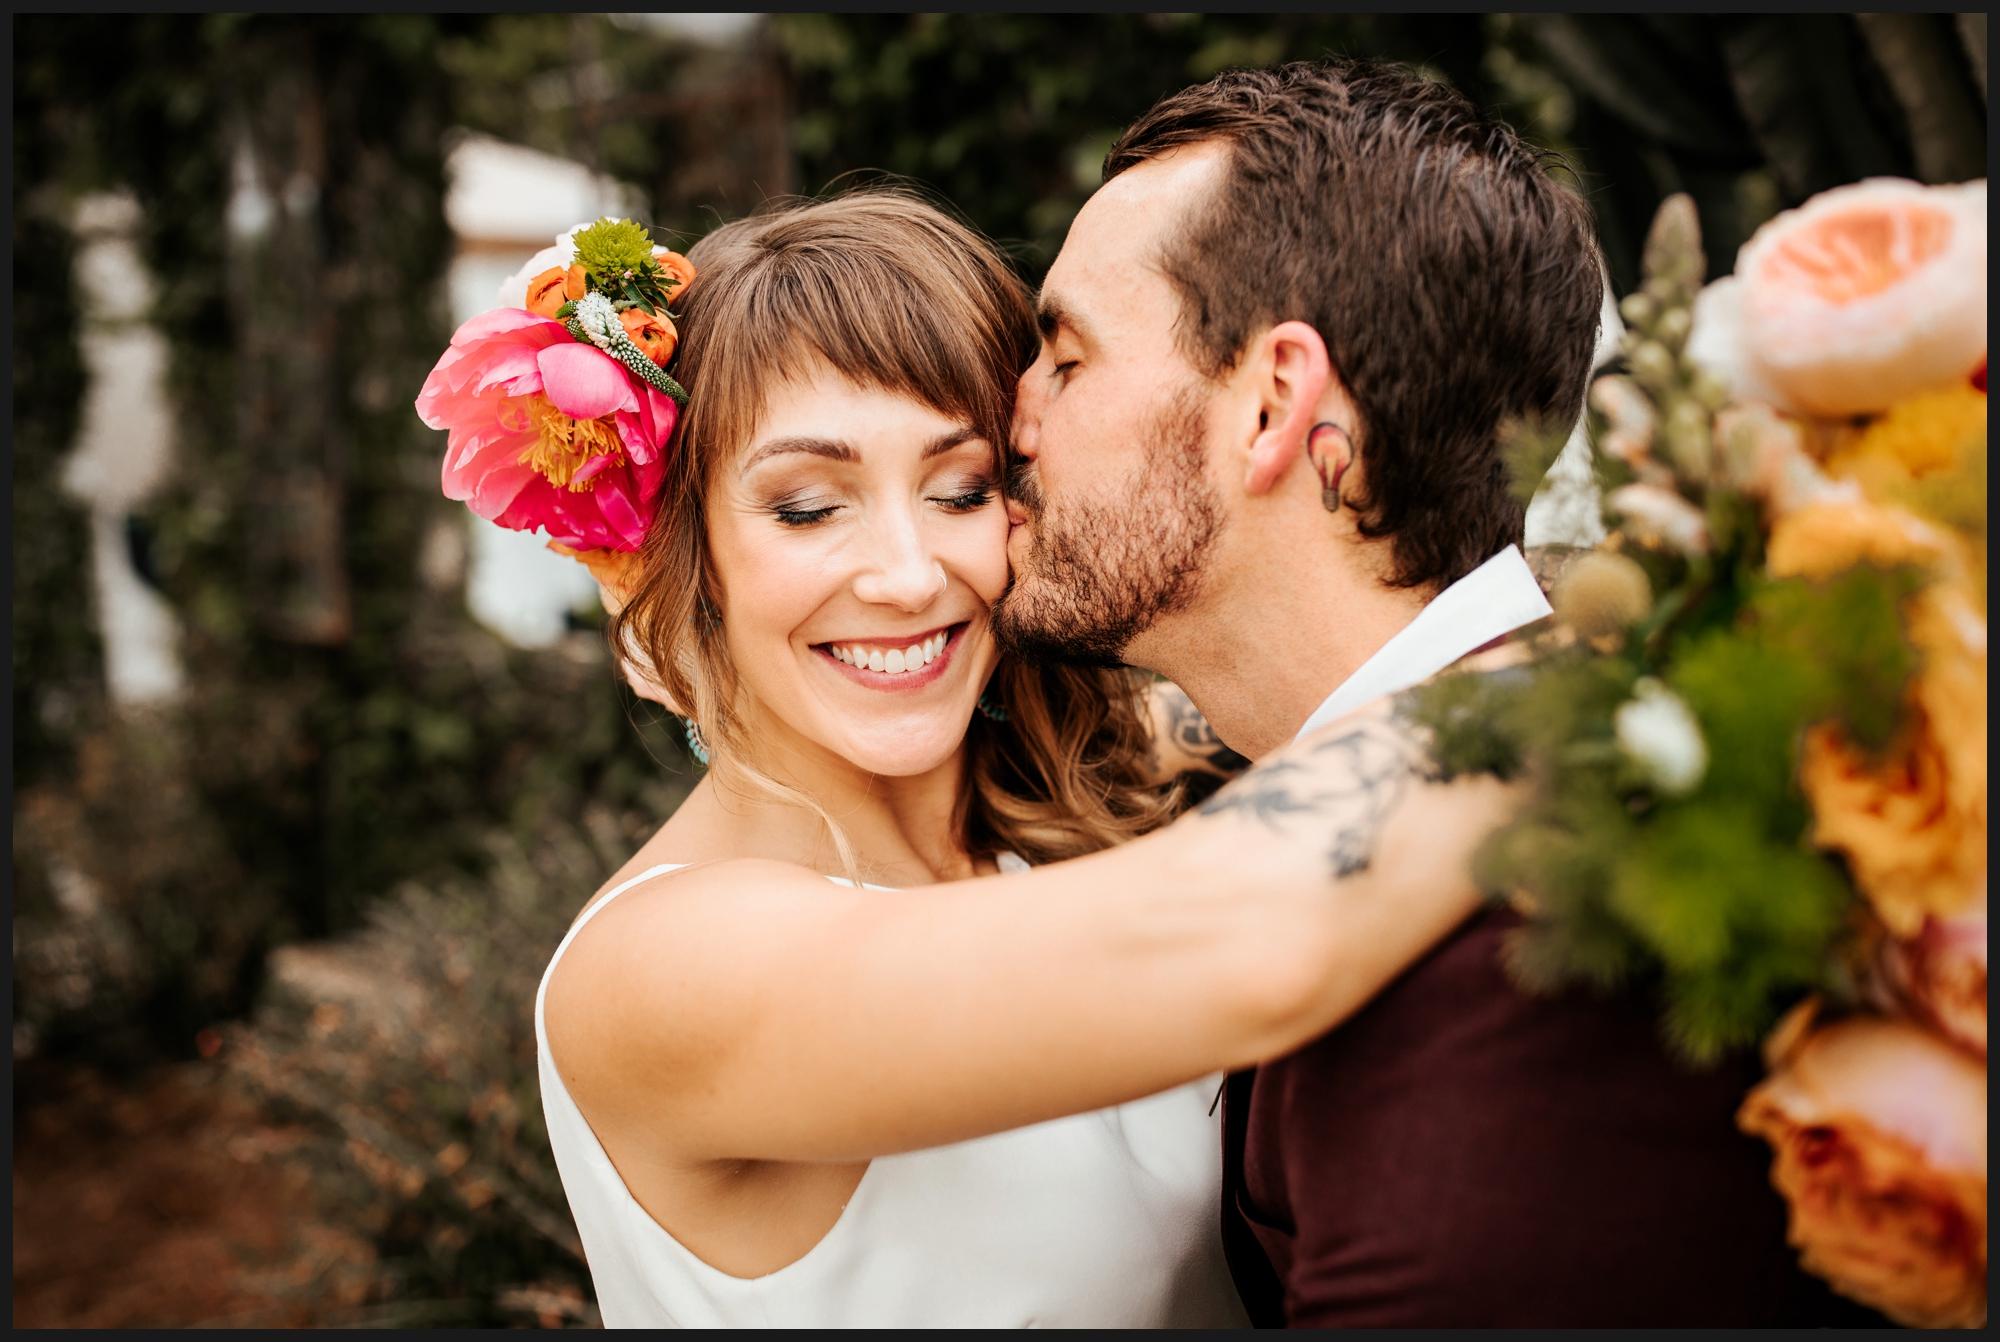 Orlando-Wedding-Photographer-destination-wedding-photographer-florida-wedding-photographer-bohemian-wedding-photographer_1990.jpg